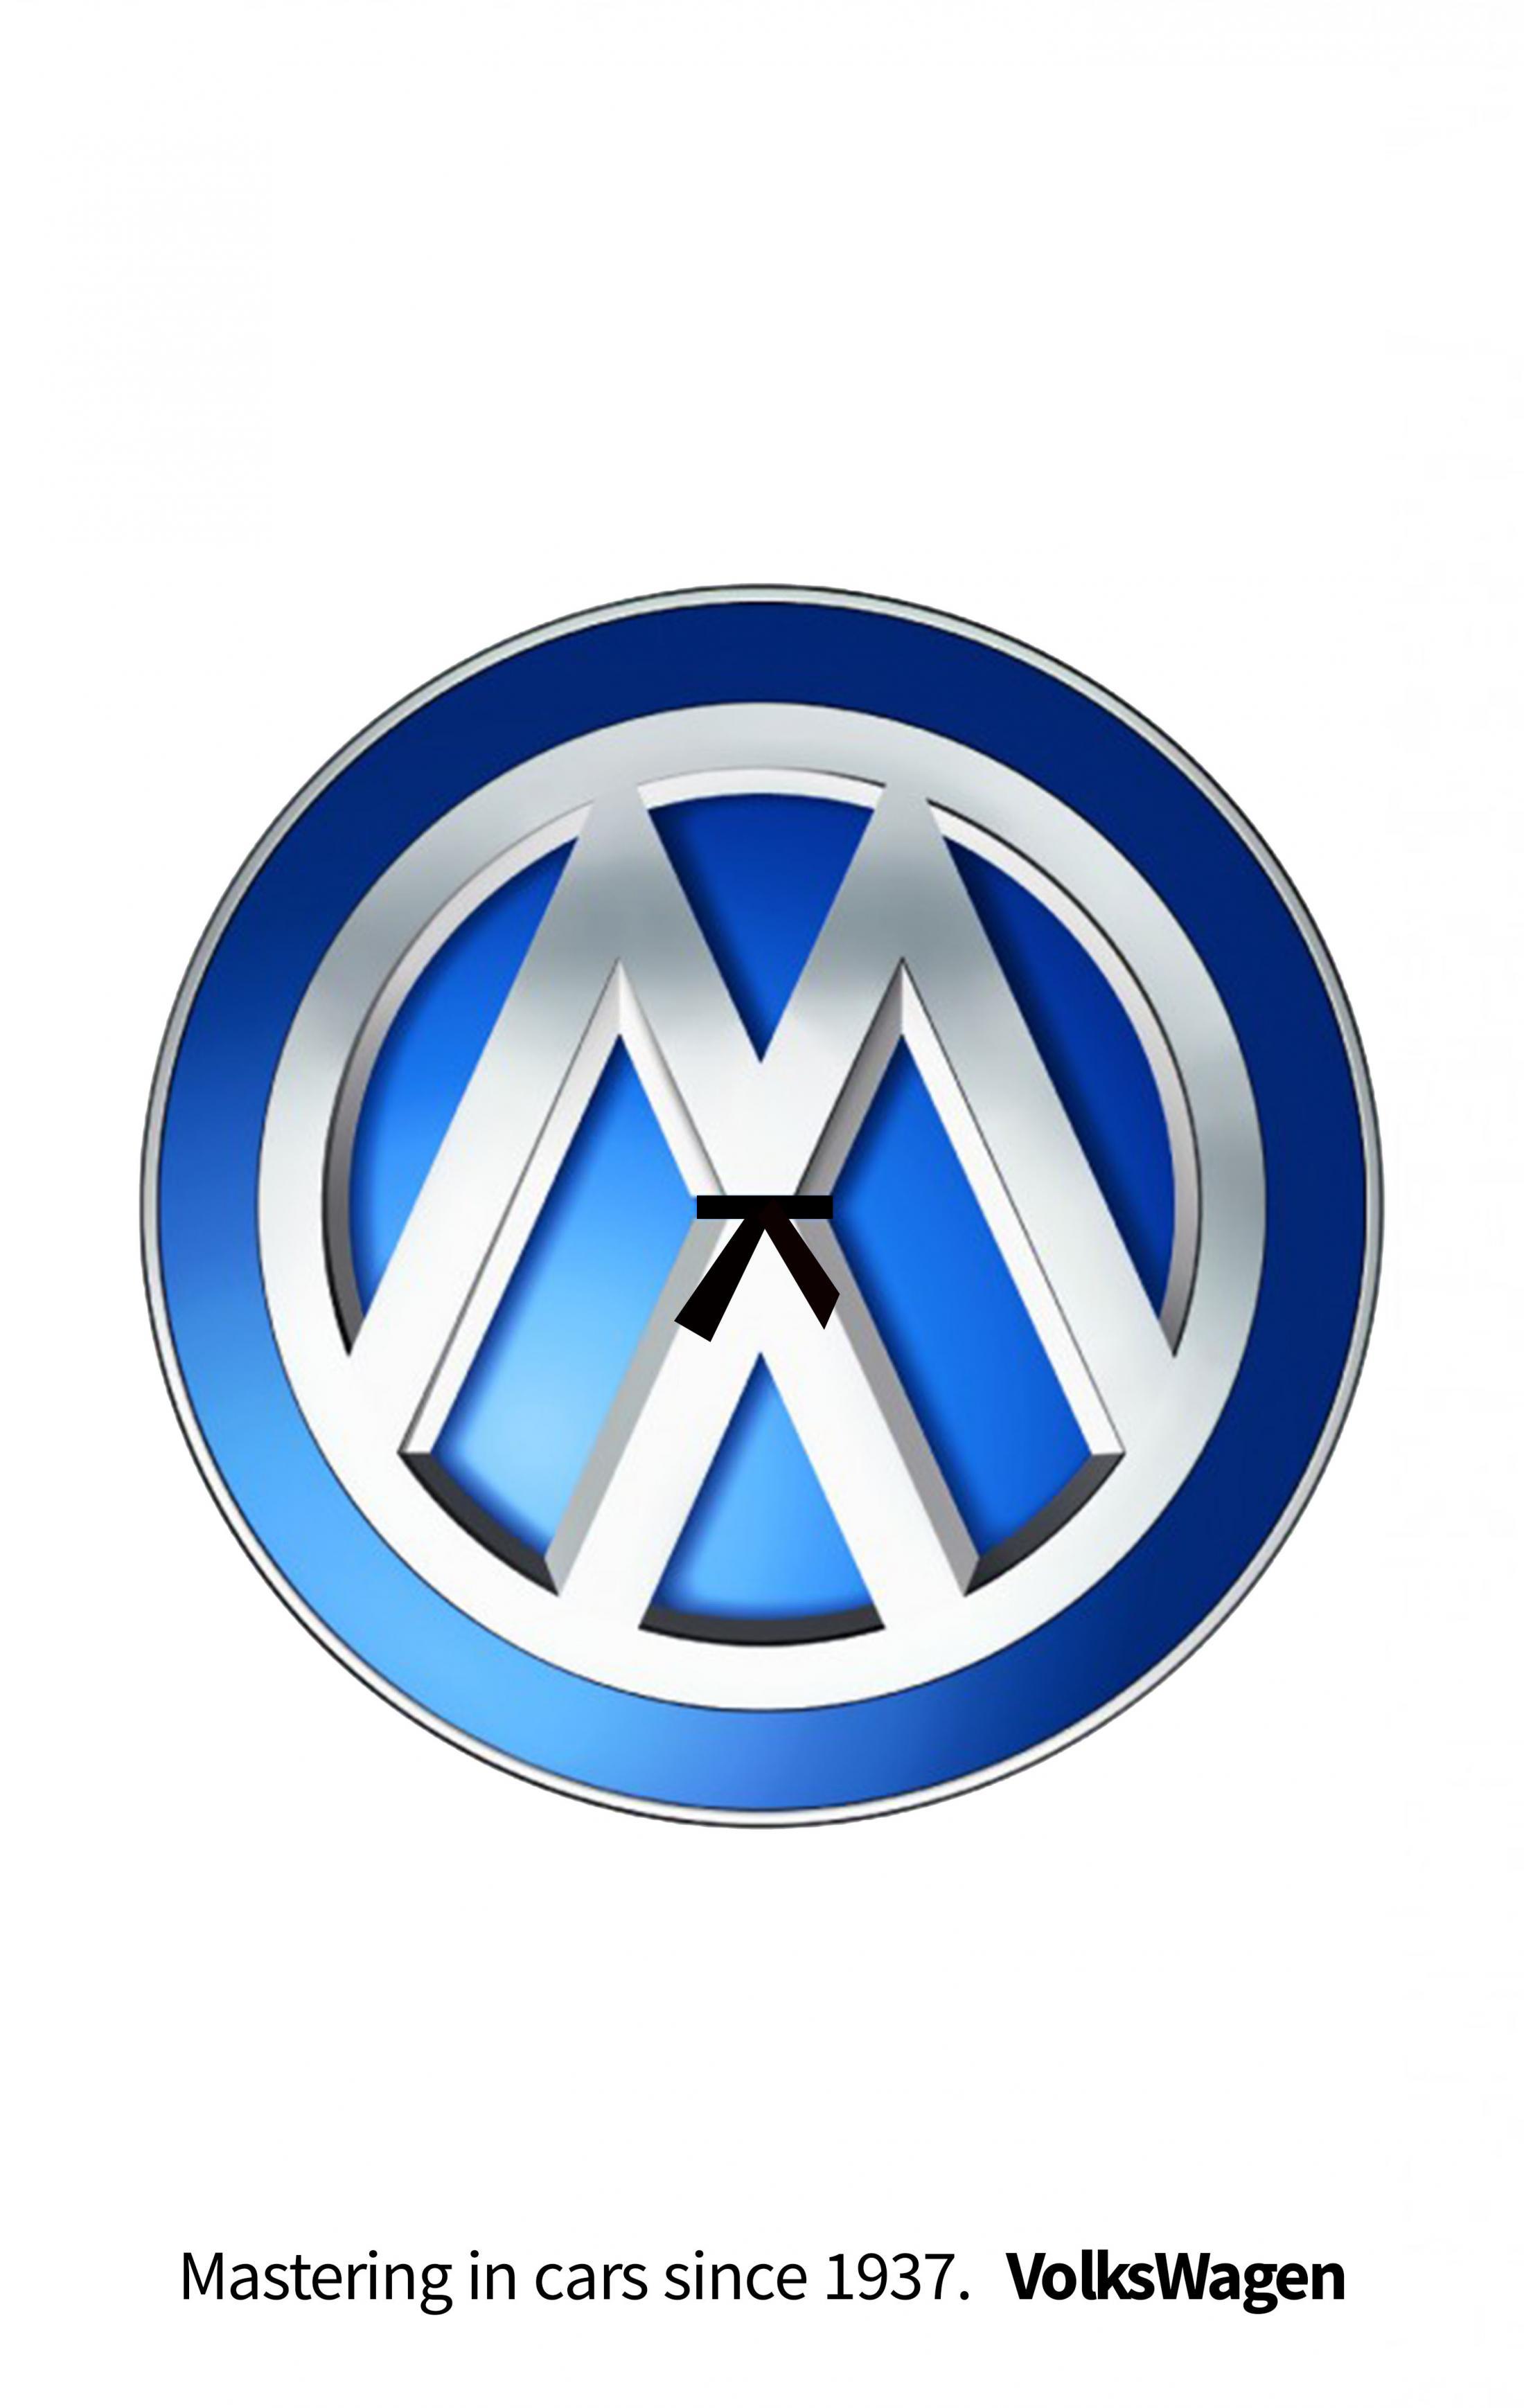 Volkswagen Print Ad - Mastering In Cars